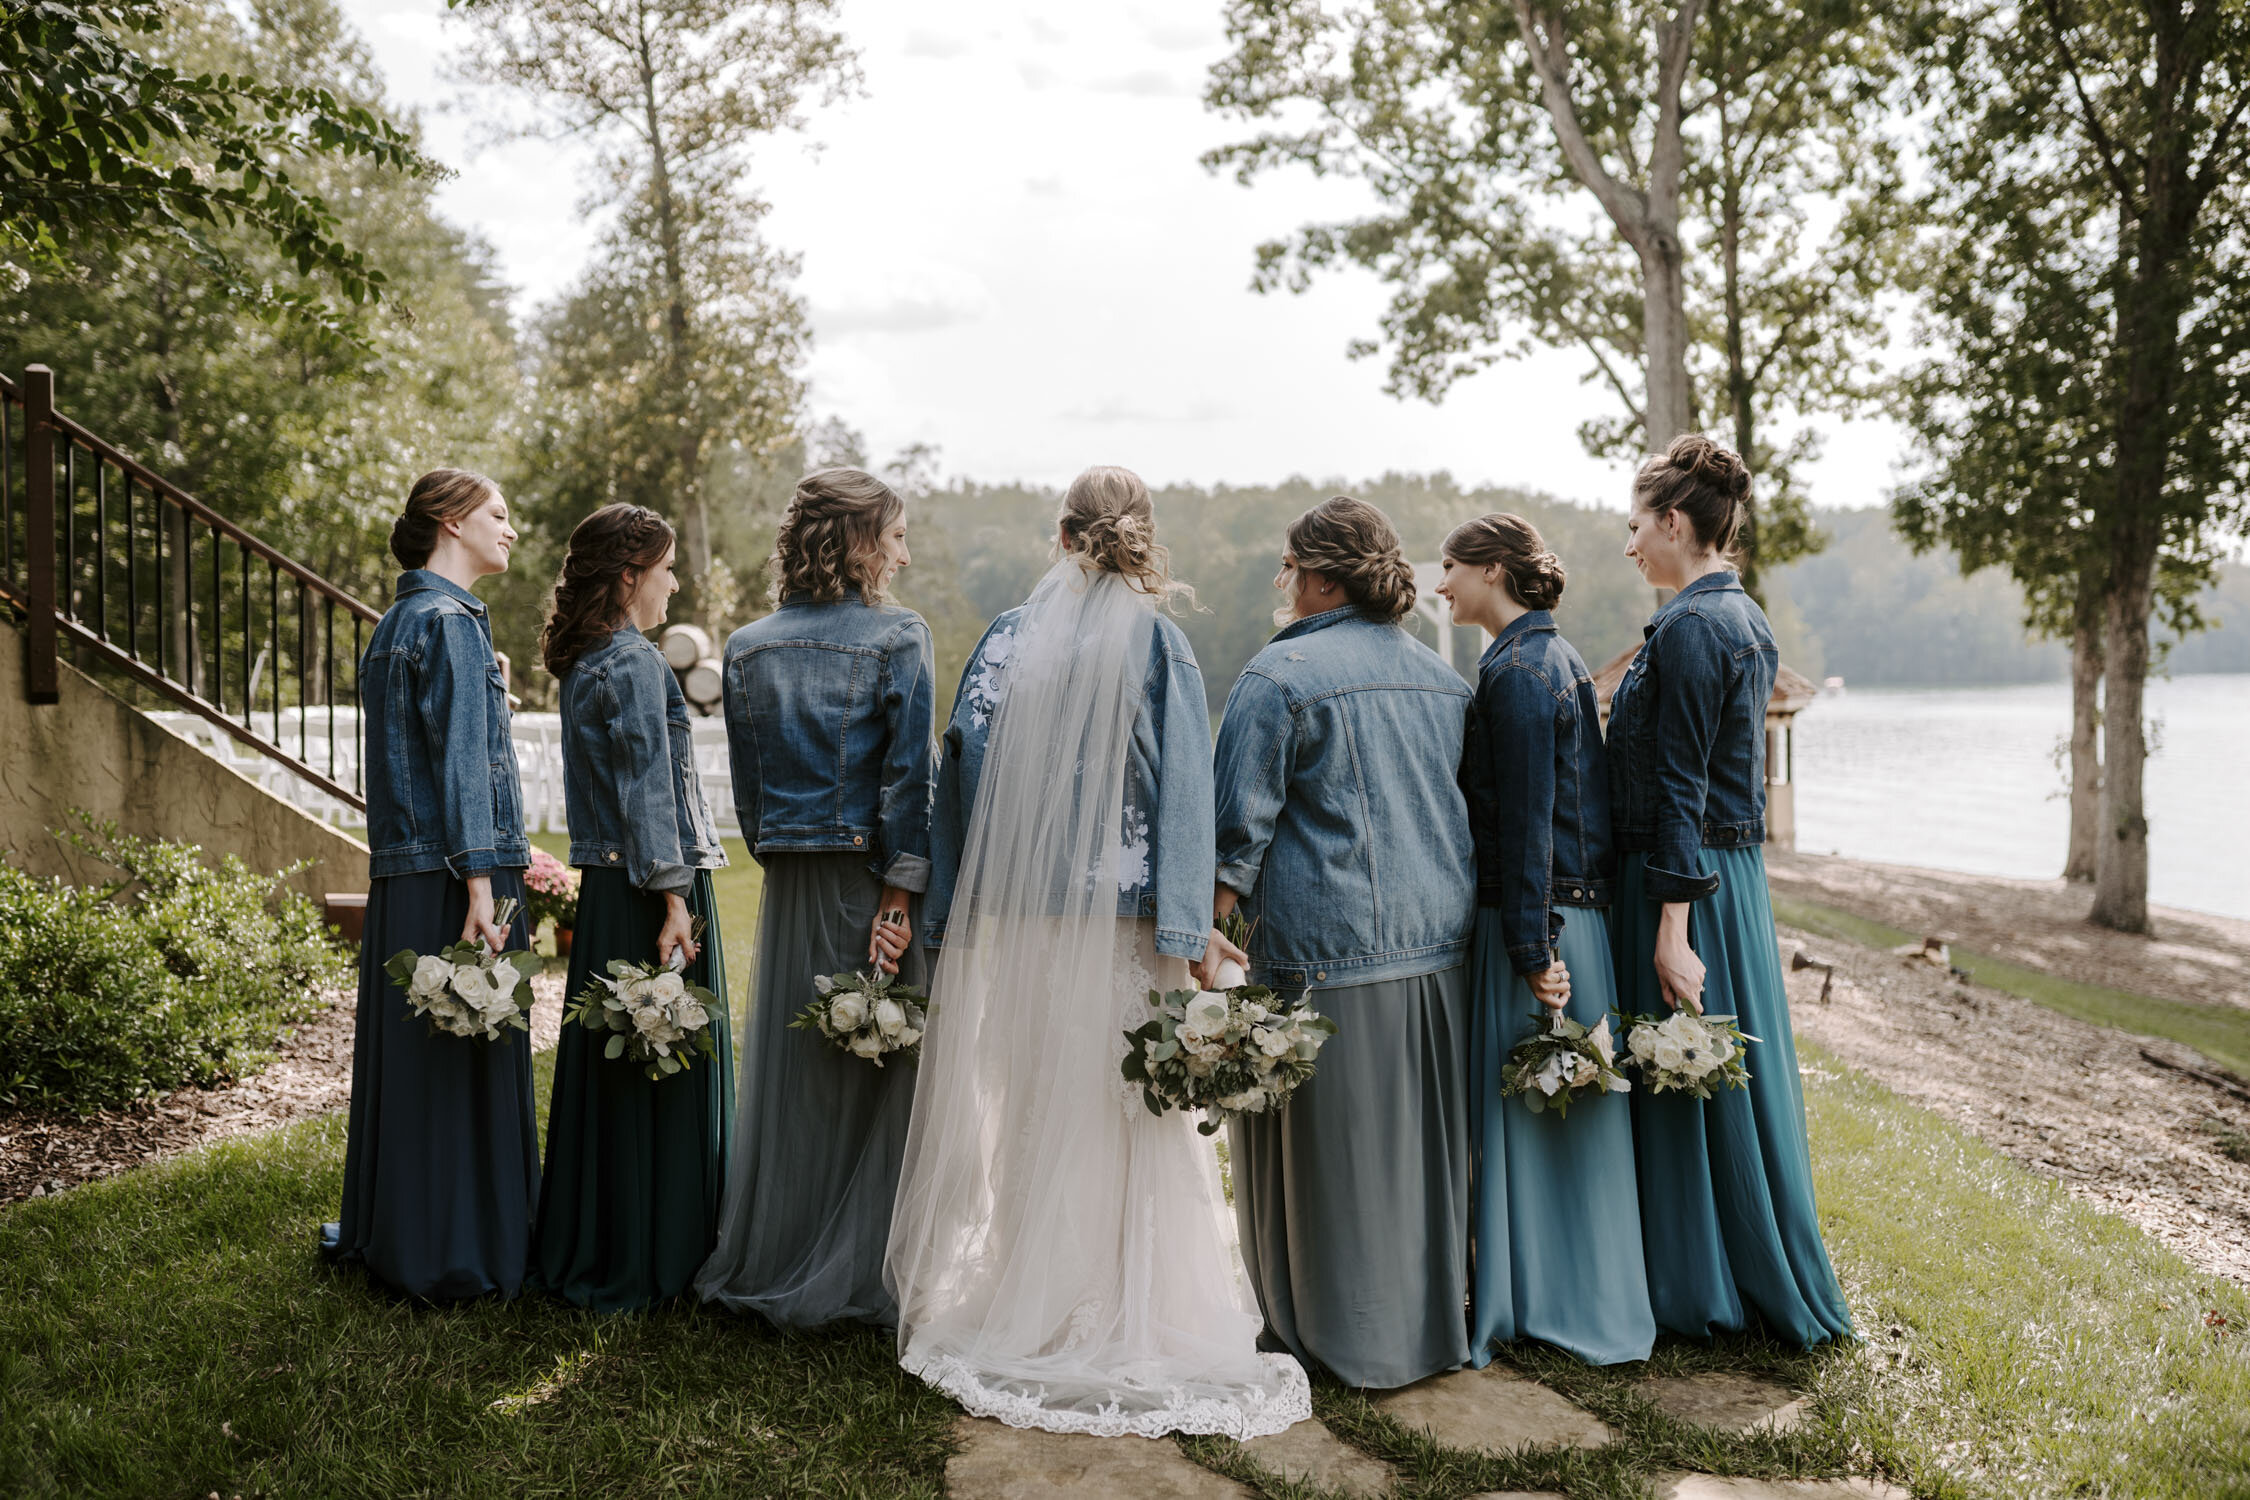 Fun Bridesmaids & wedding party portraits with cool denim jackets  at Bella Collina   By Greensboro, NC Wedding Photographer: Kayli LaFon Photography